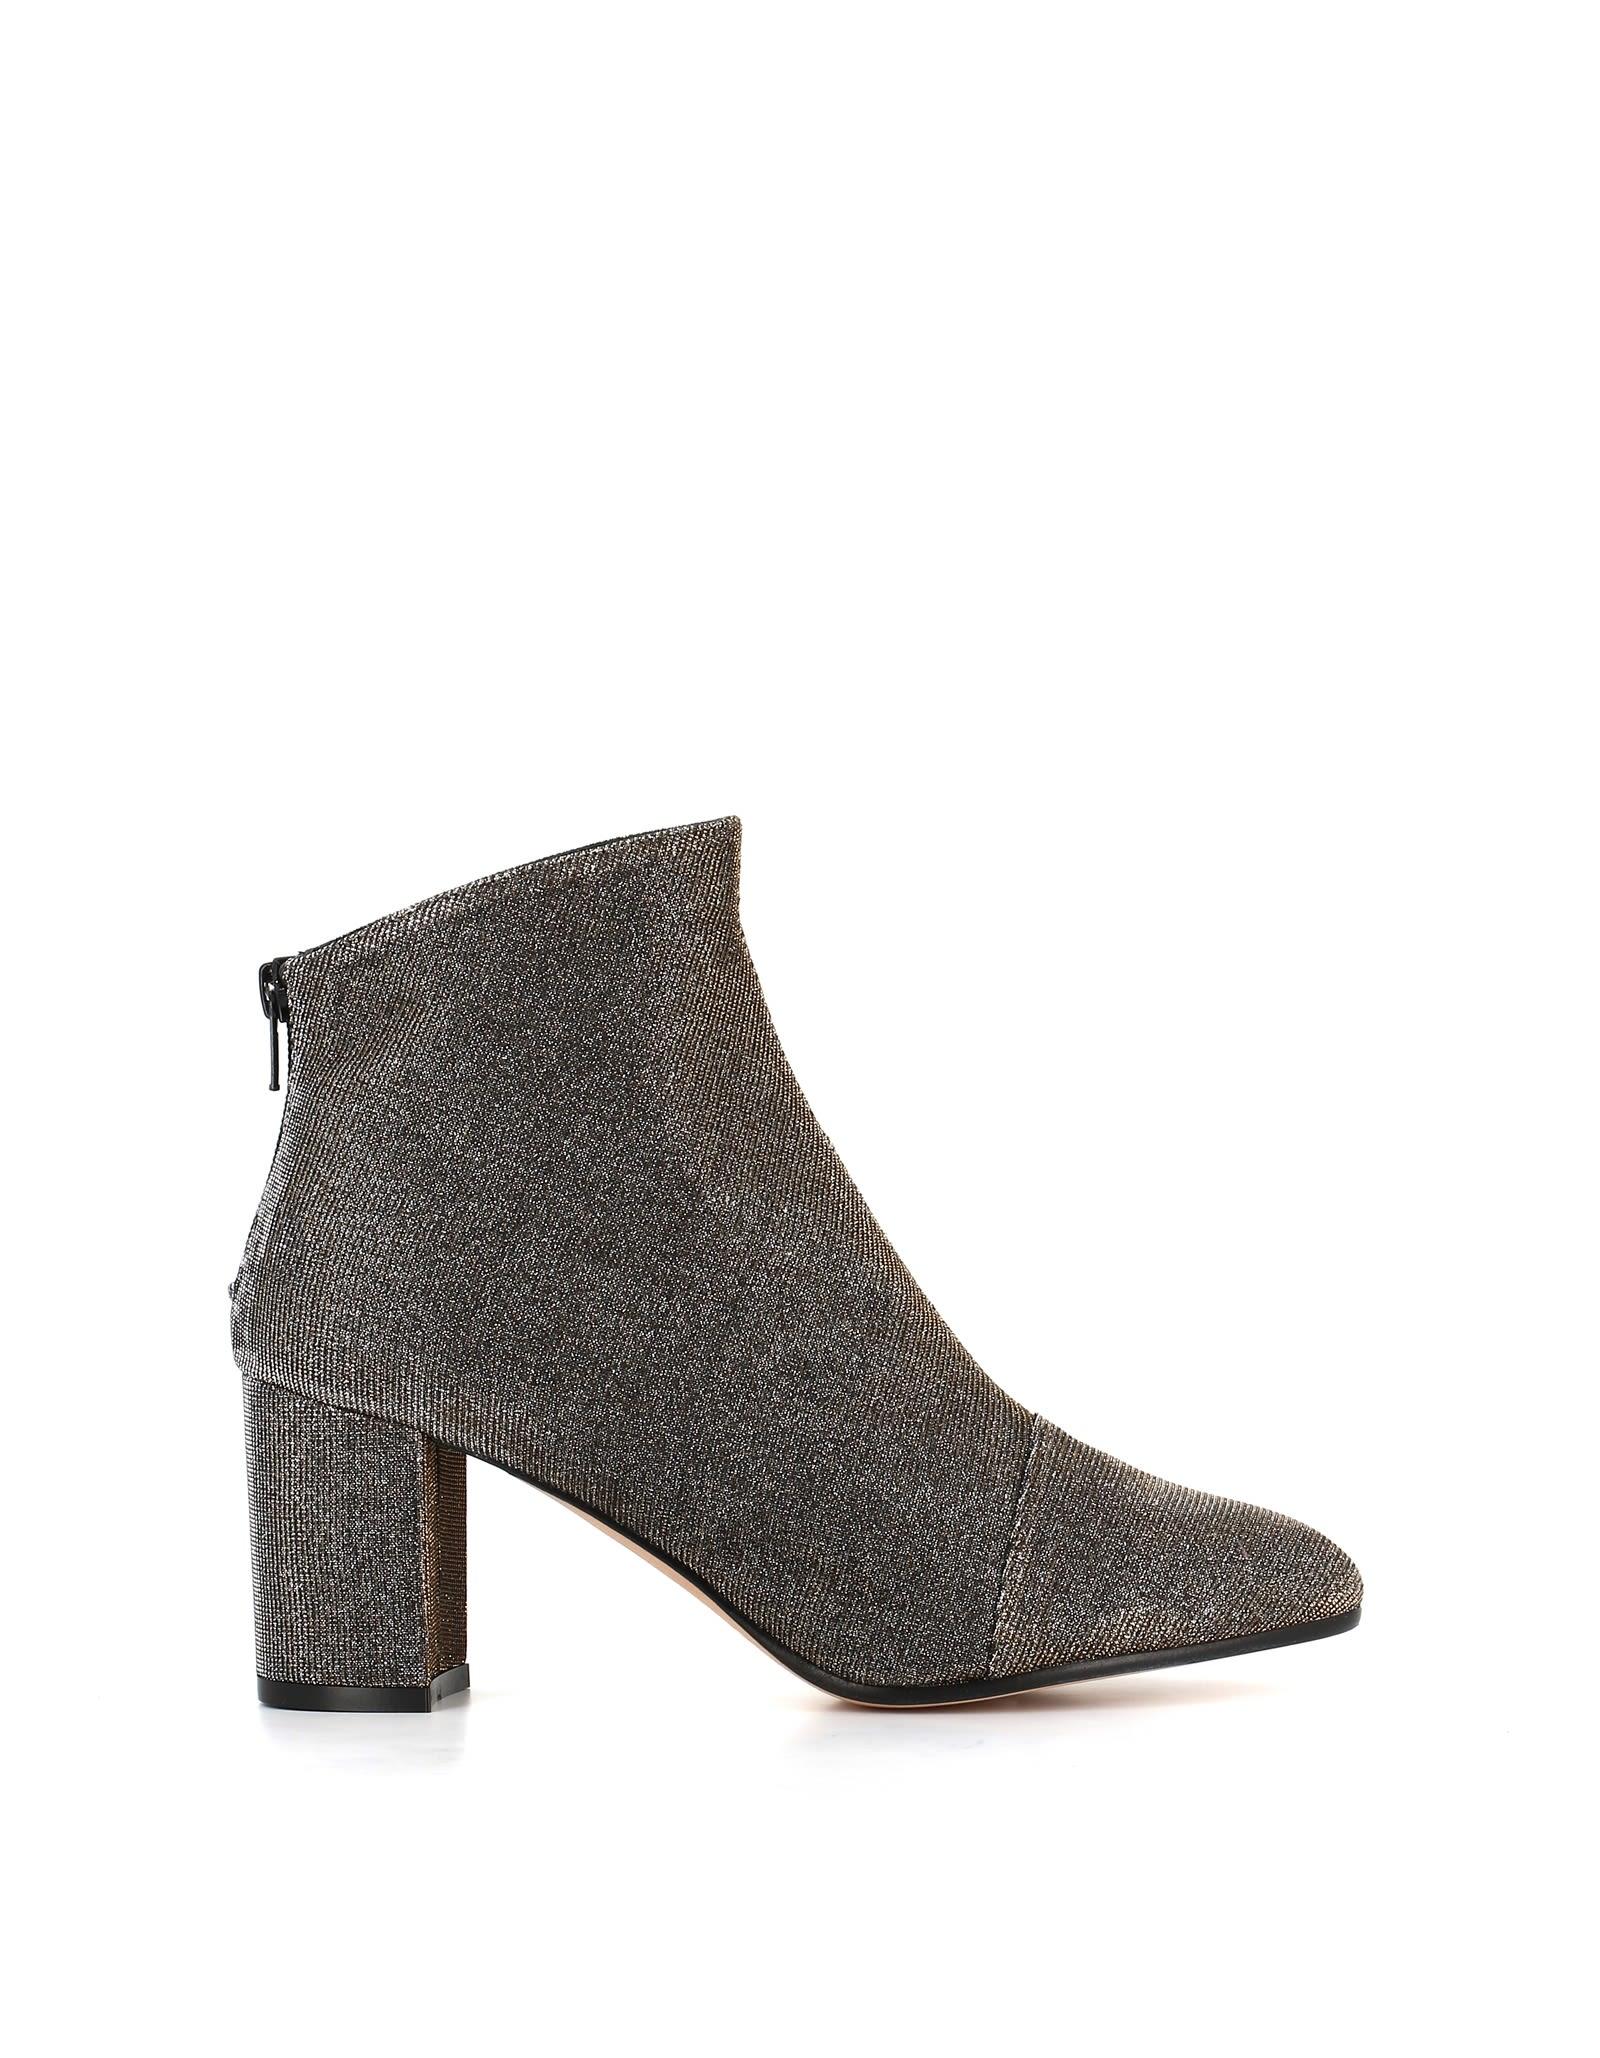 "JEAN-MICHEL CAZABAT Jean-Michel Cazabat Ankle Boots ""Gilberta"" in Silver"